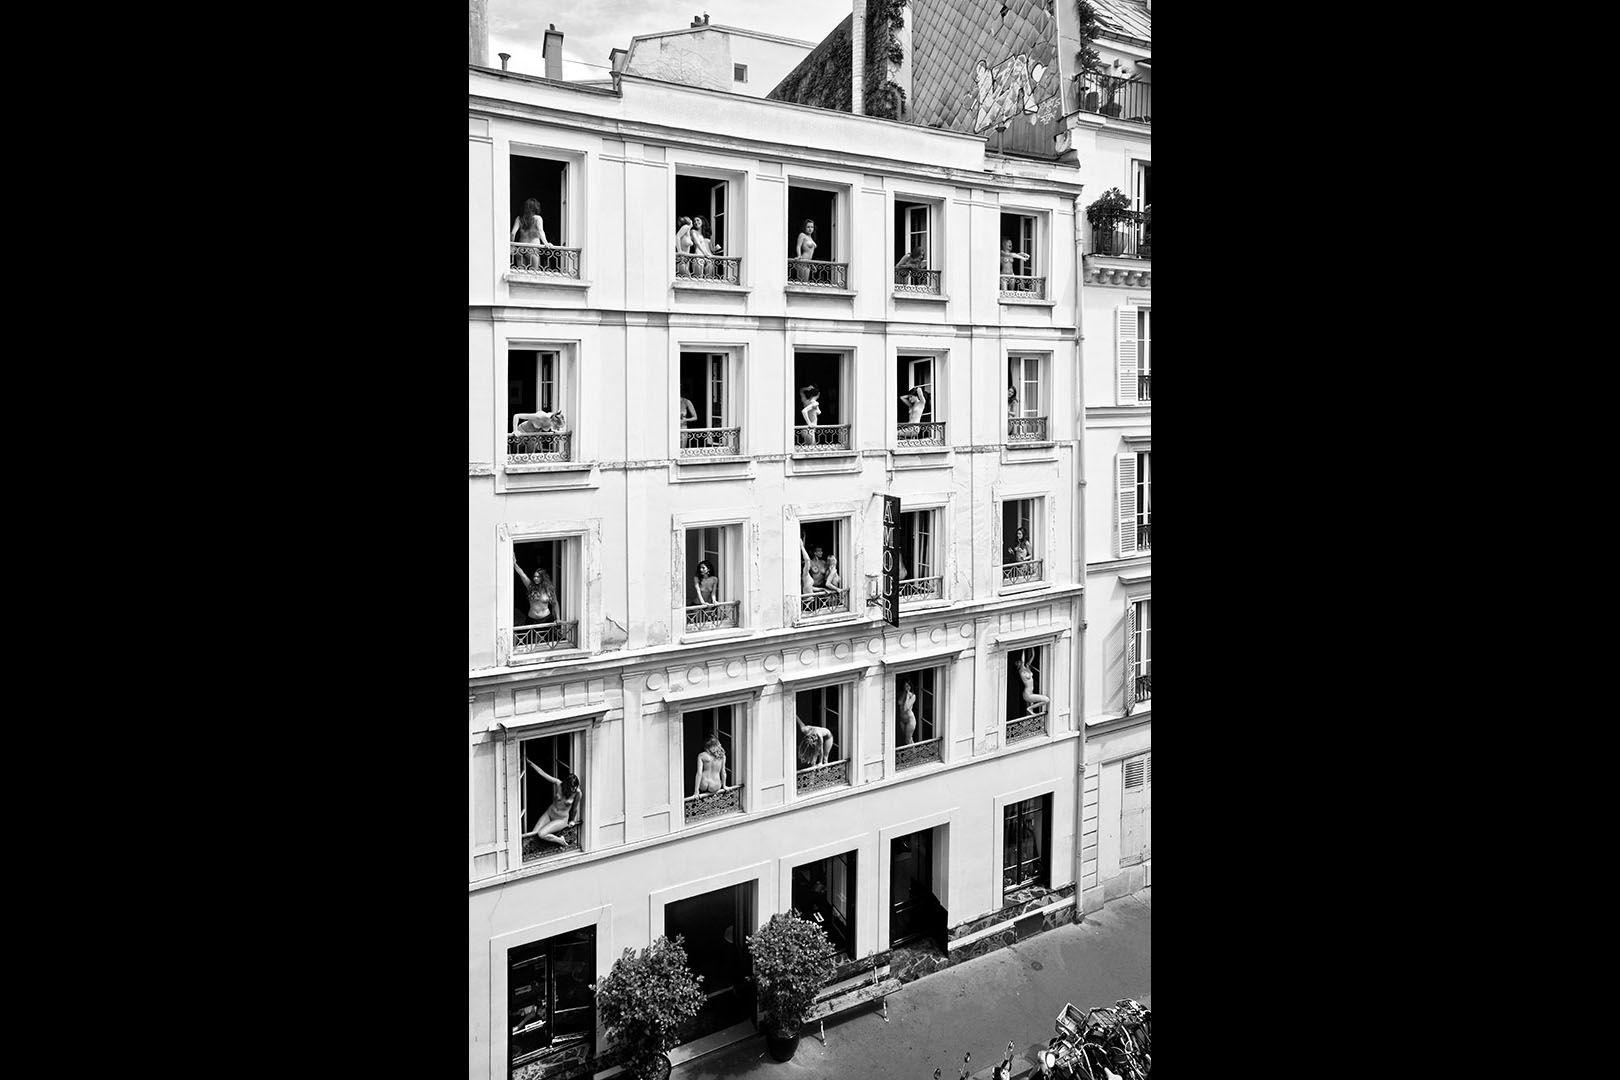 Hotel Amour 1 Paris France Travel Europe